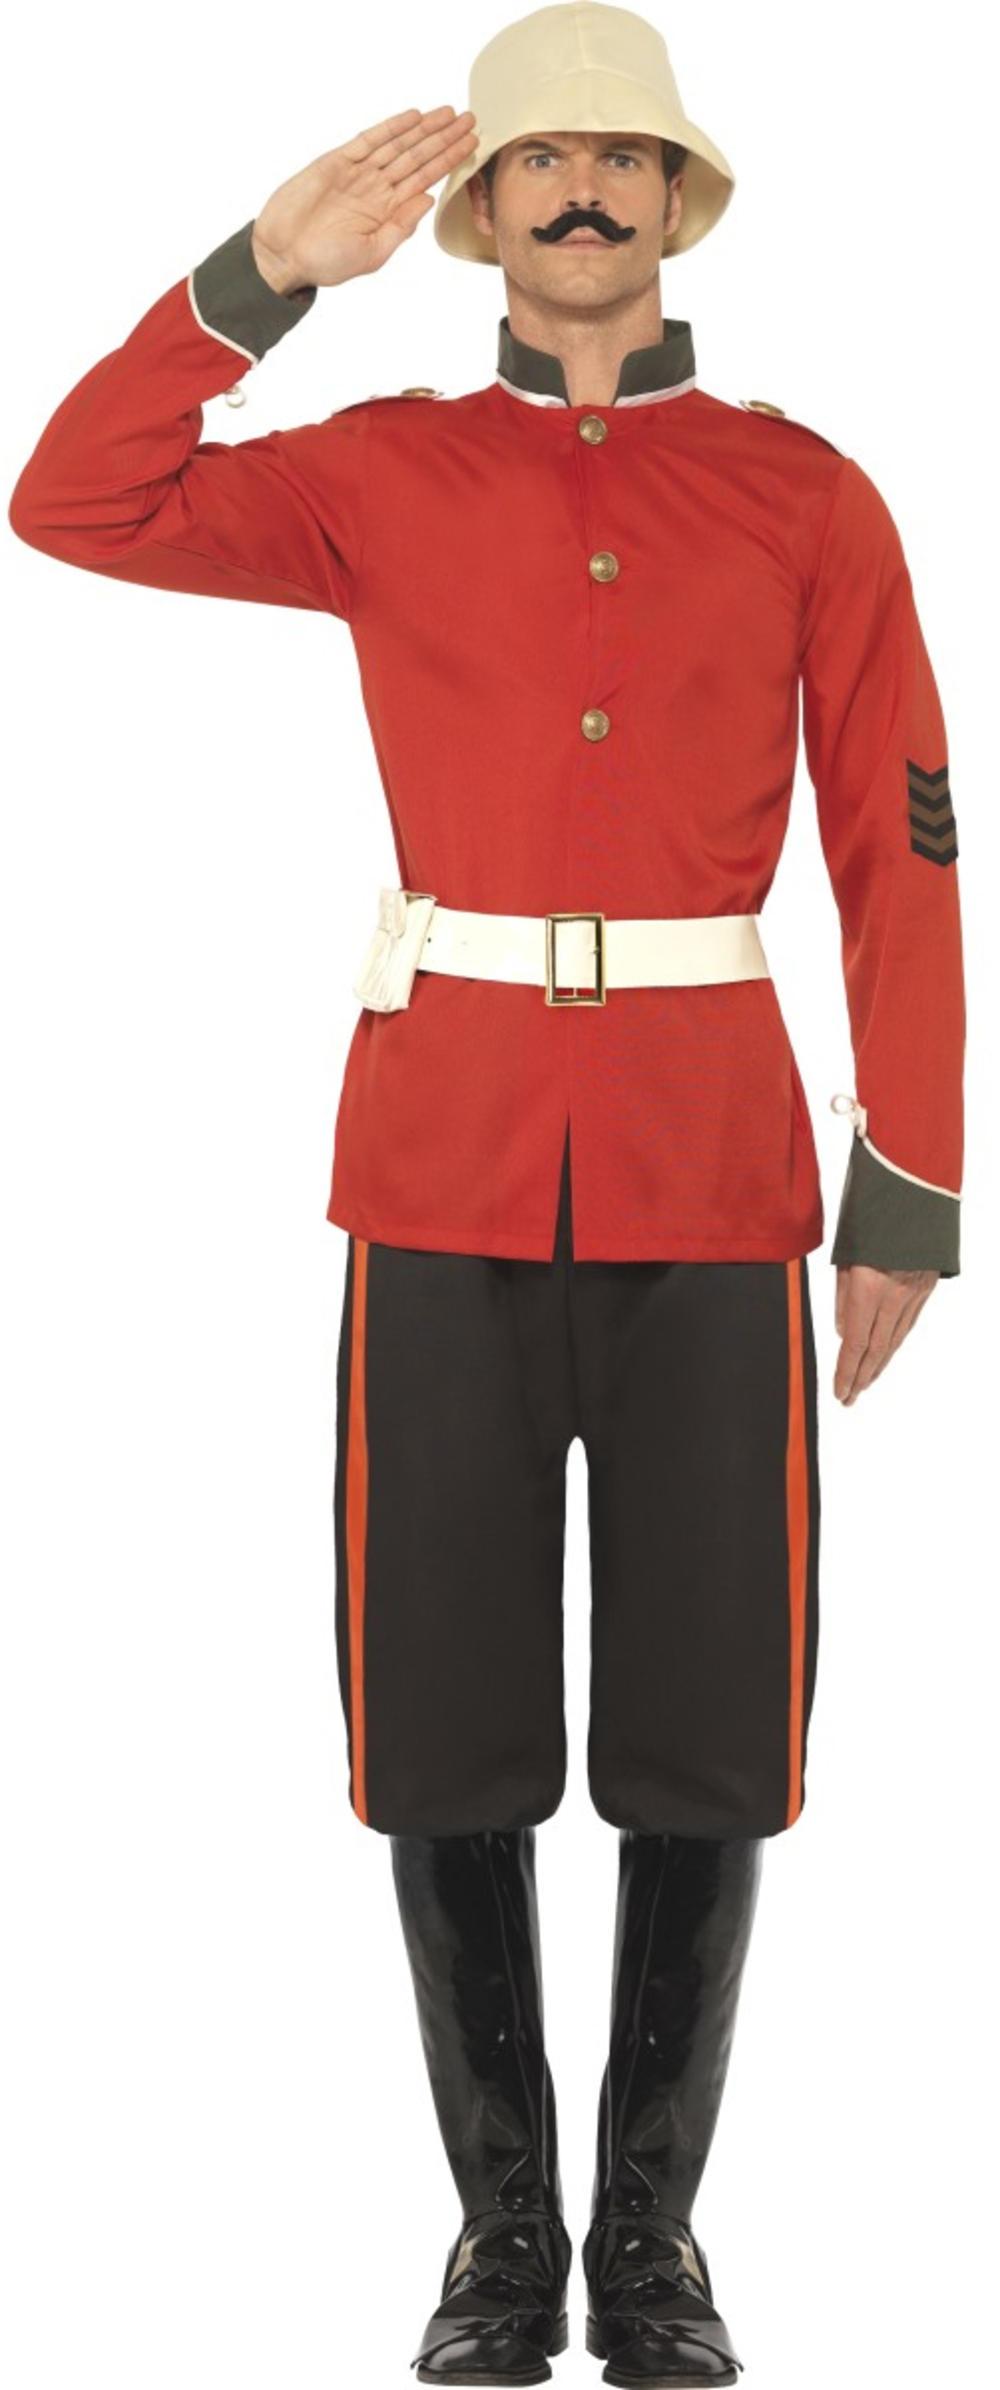 Boer War Soldier Mens Fancy Dress British Military Army Uniform Adults Costume